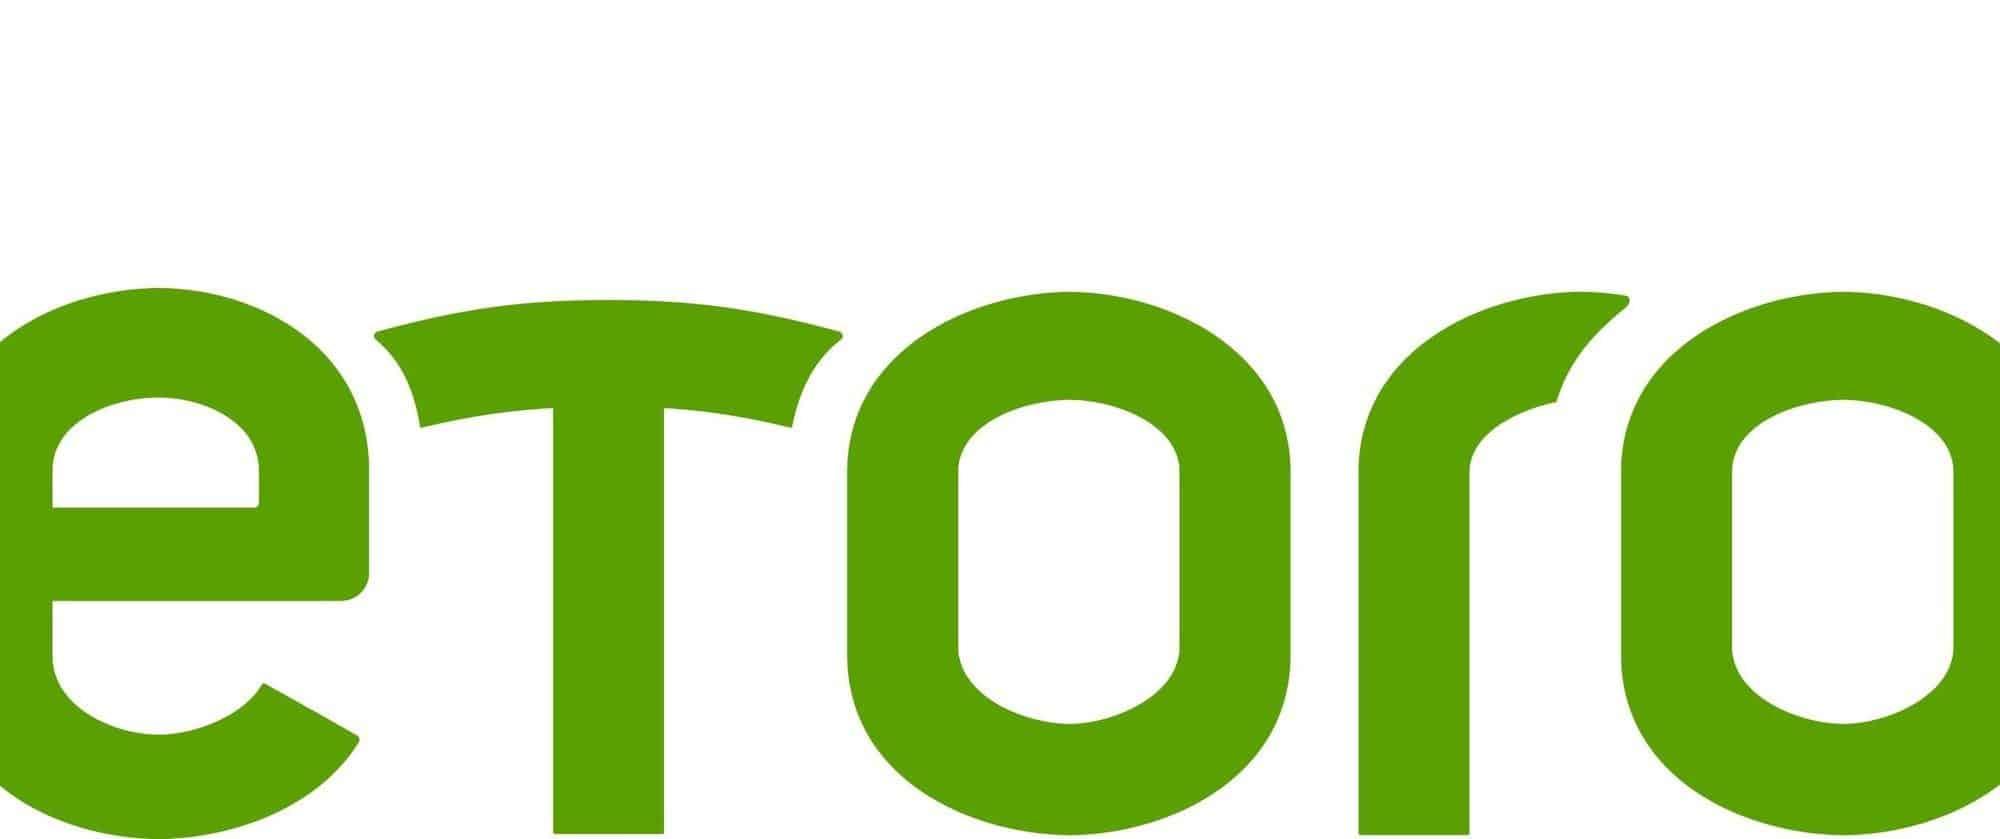 etoro-stock-featured-image